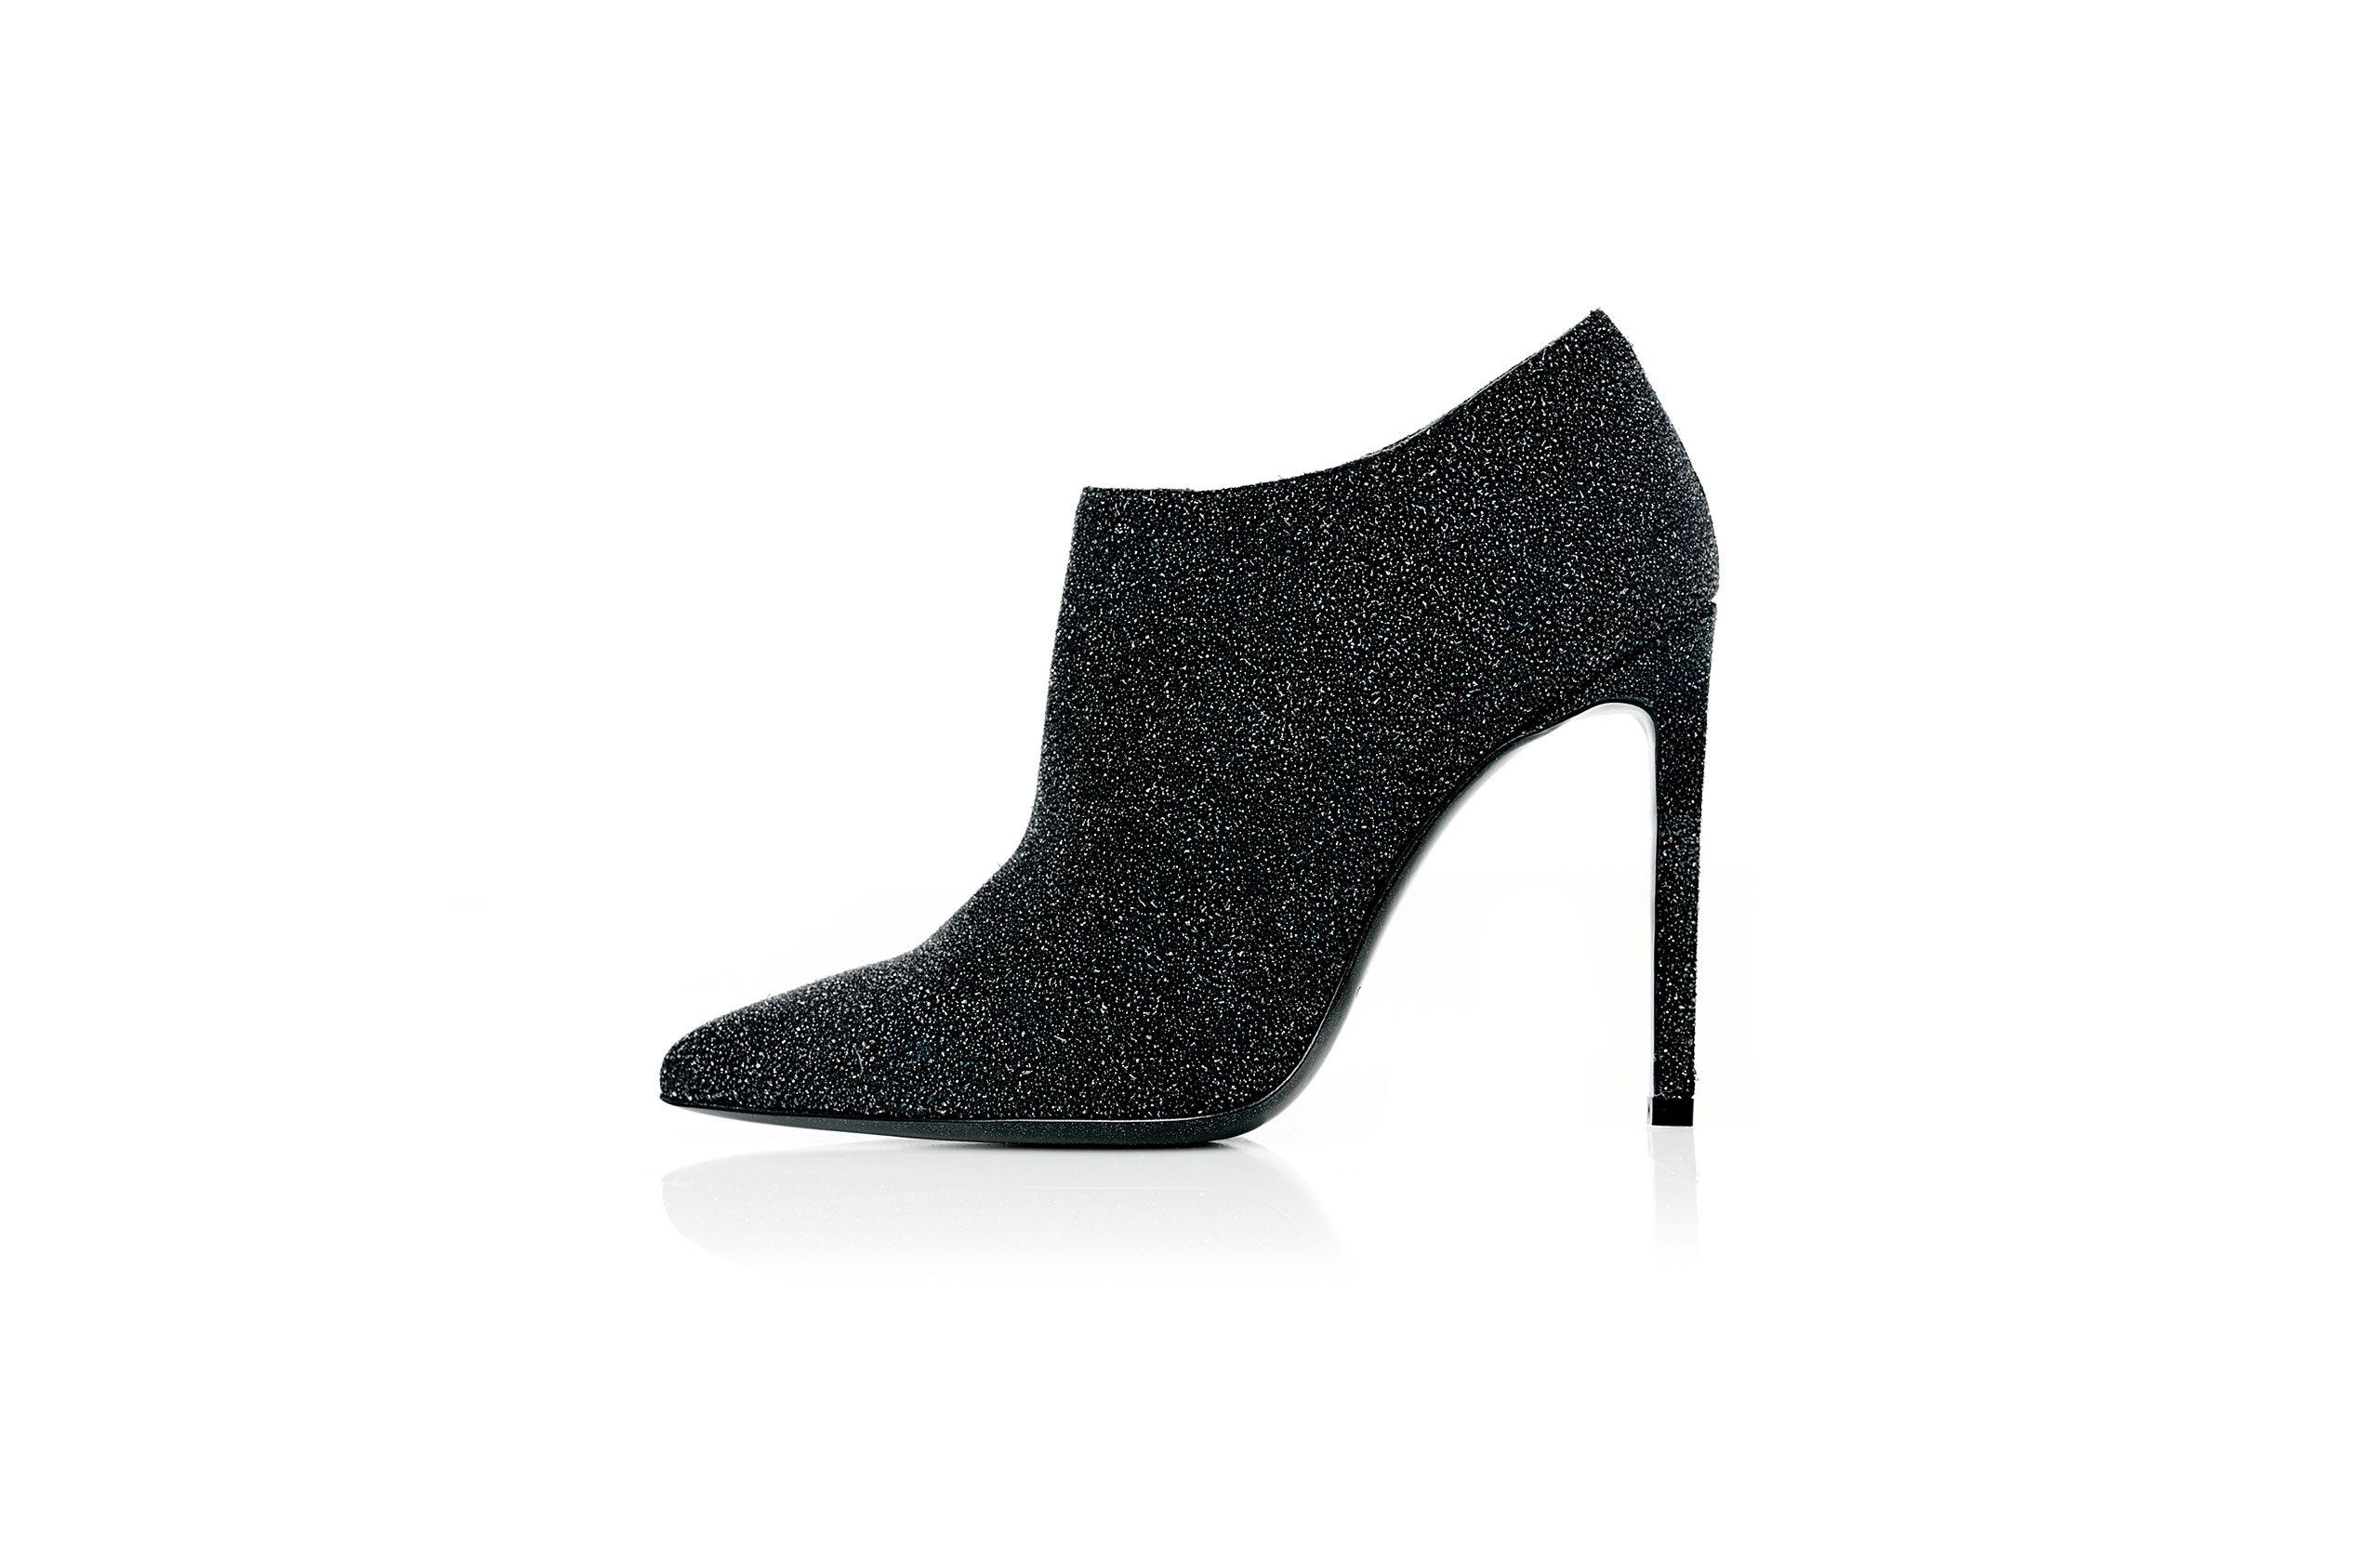 #susanatraca #susanatracashoes #fw2015 #beautiful #high #boots #heels #black #style #shoes